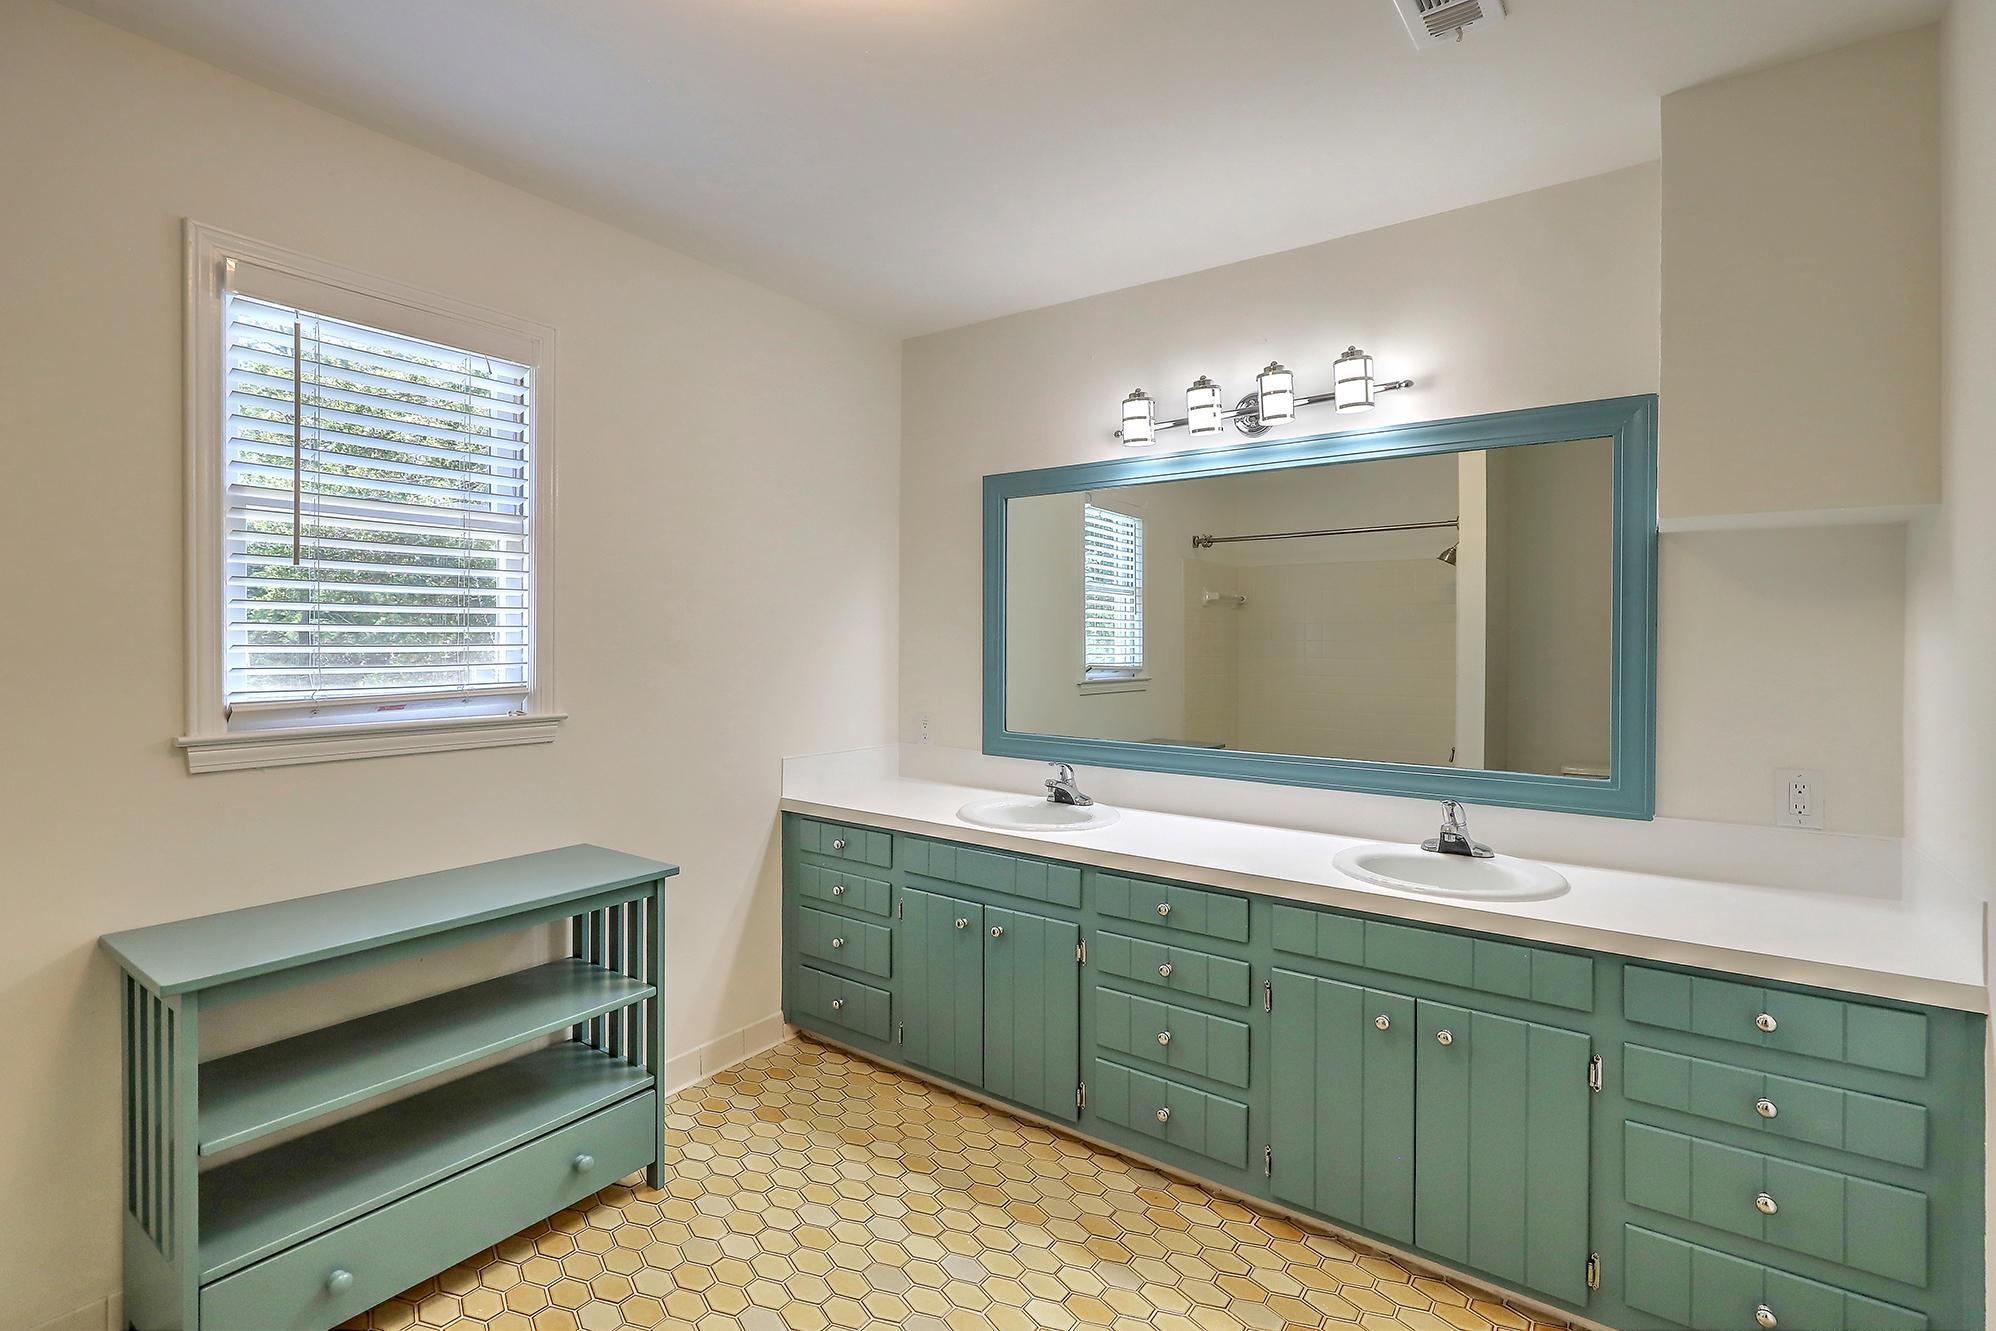 Edgewater Park Homes For Sale - 1413 Edsent, Charleston, SC - 17